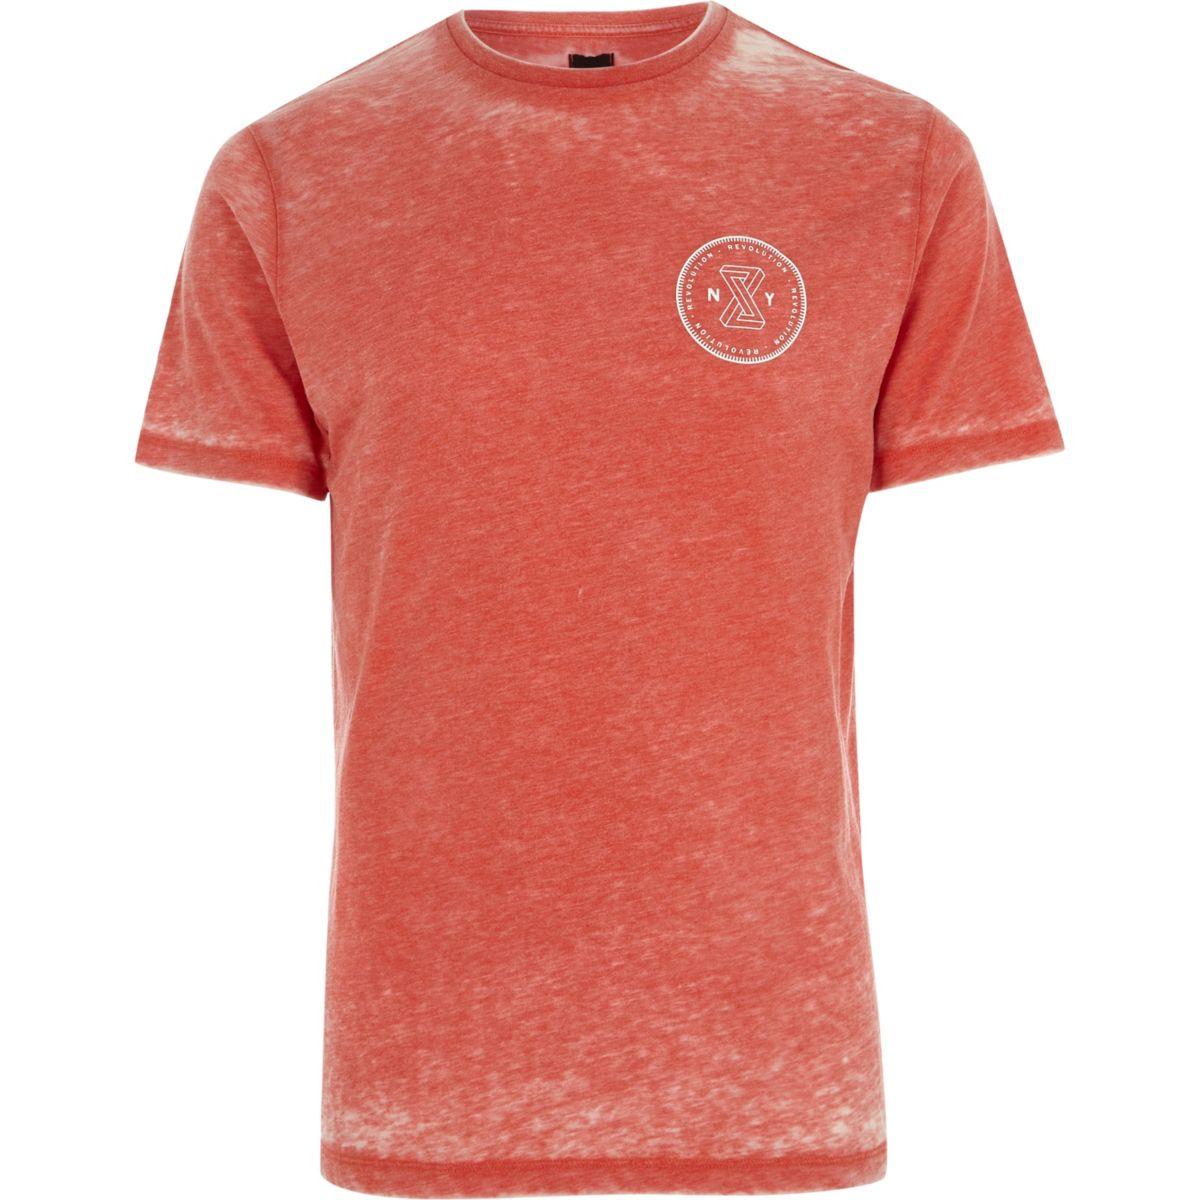 Red burnout 'revolution' slim fit T-shirt